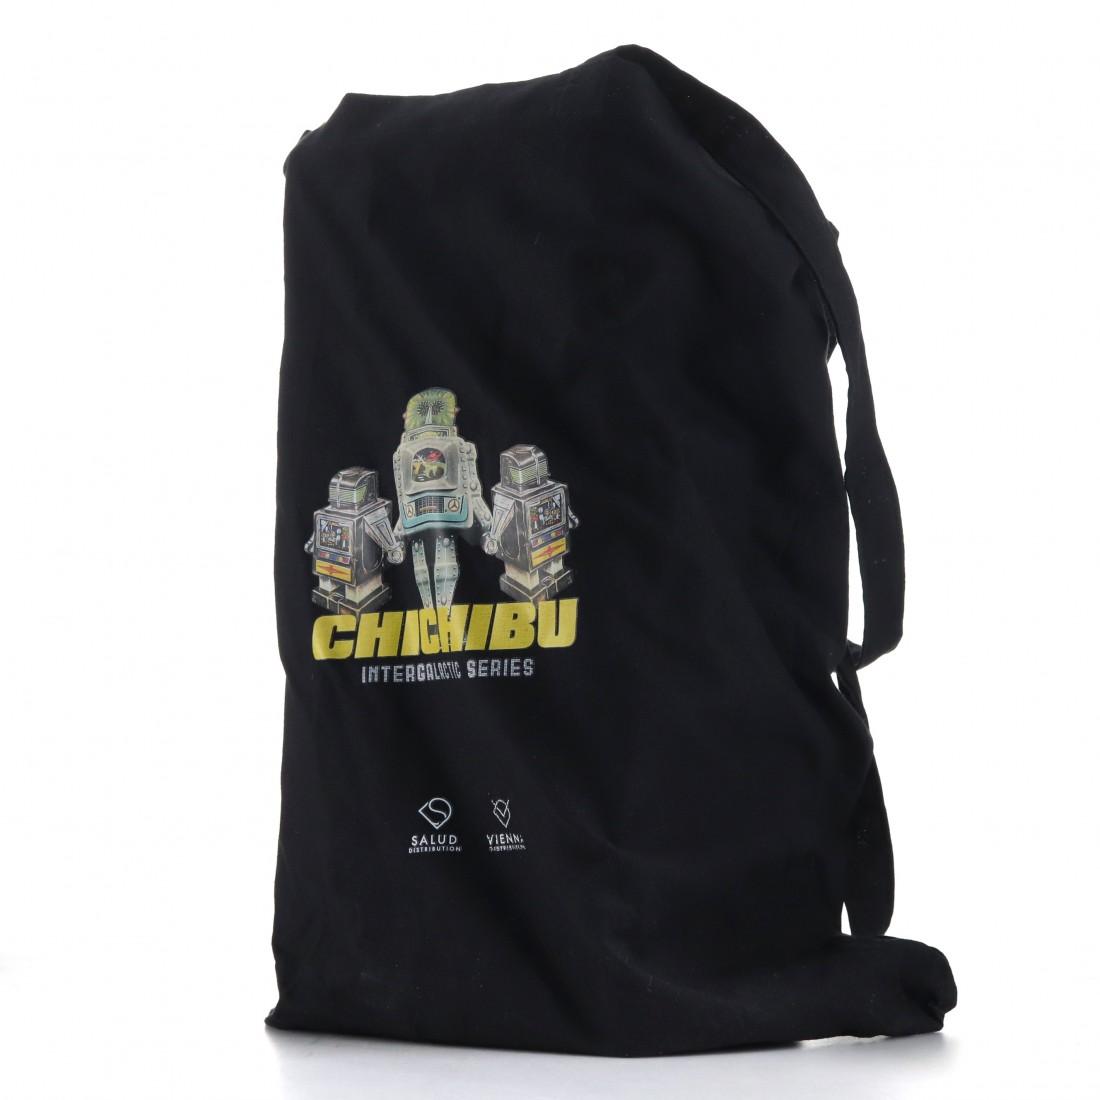 *Chichibu 2011 Single Belgian Stout Cask #4549 / Intergalactic Edition 2 - with T-shirt & Tote Bag